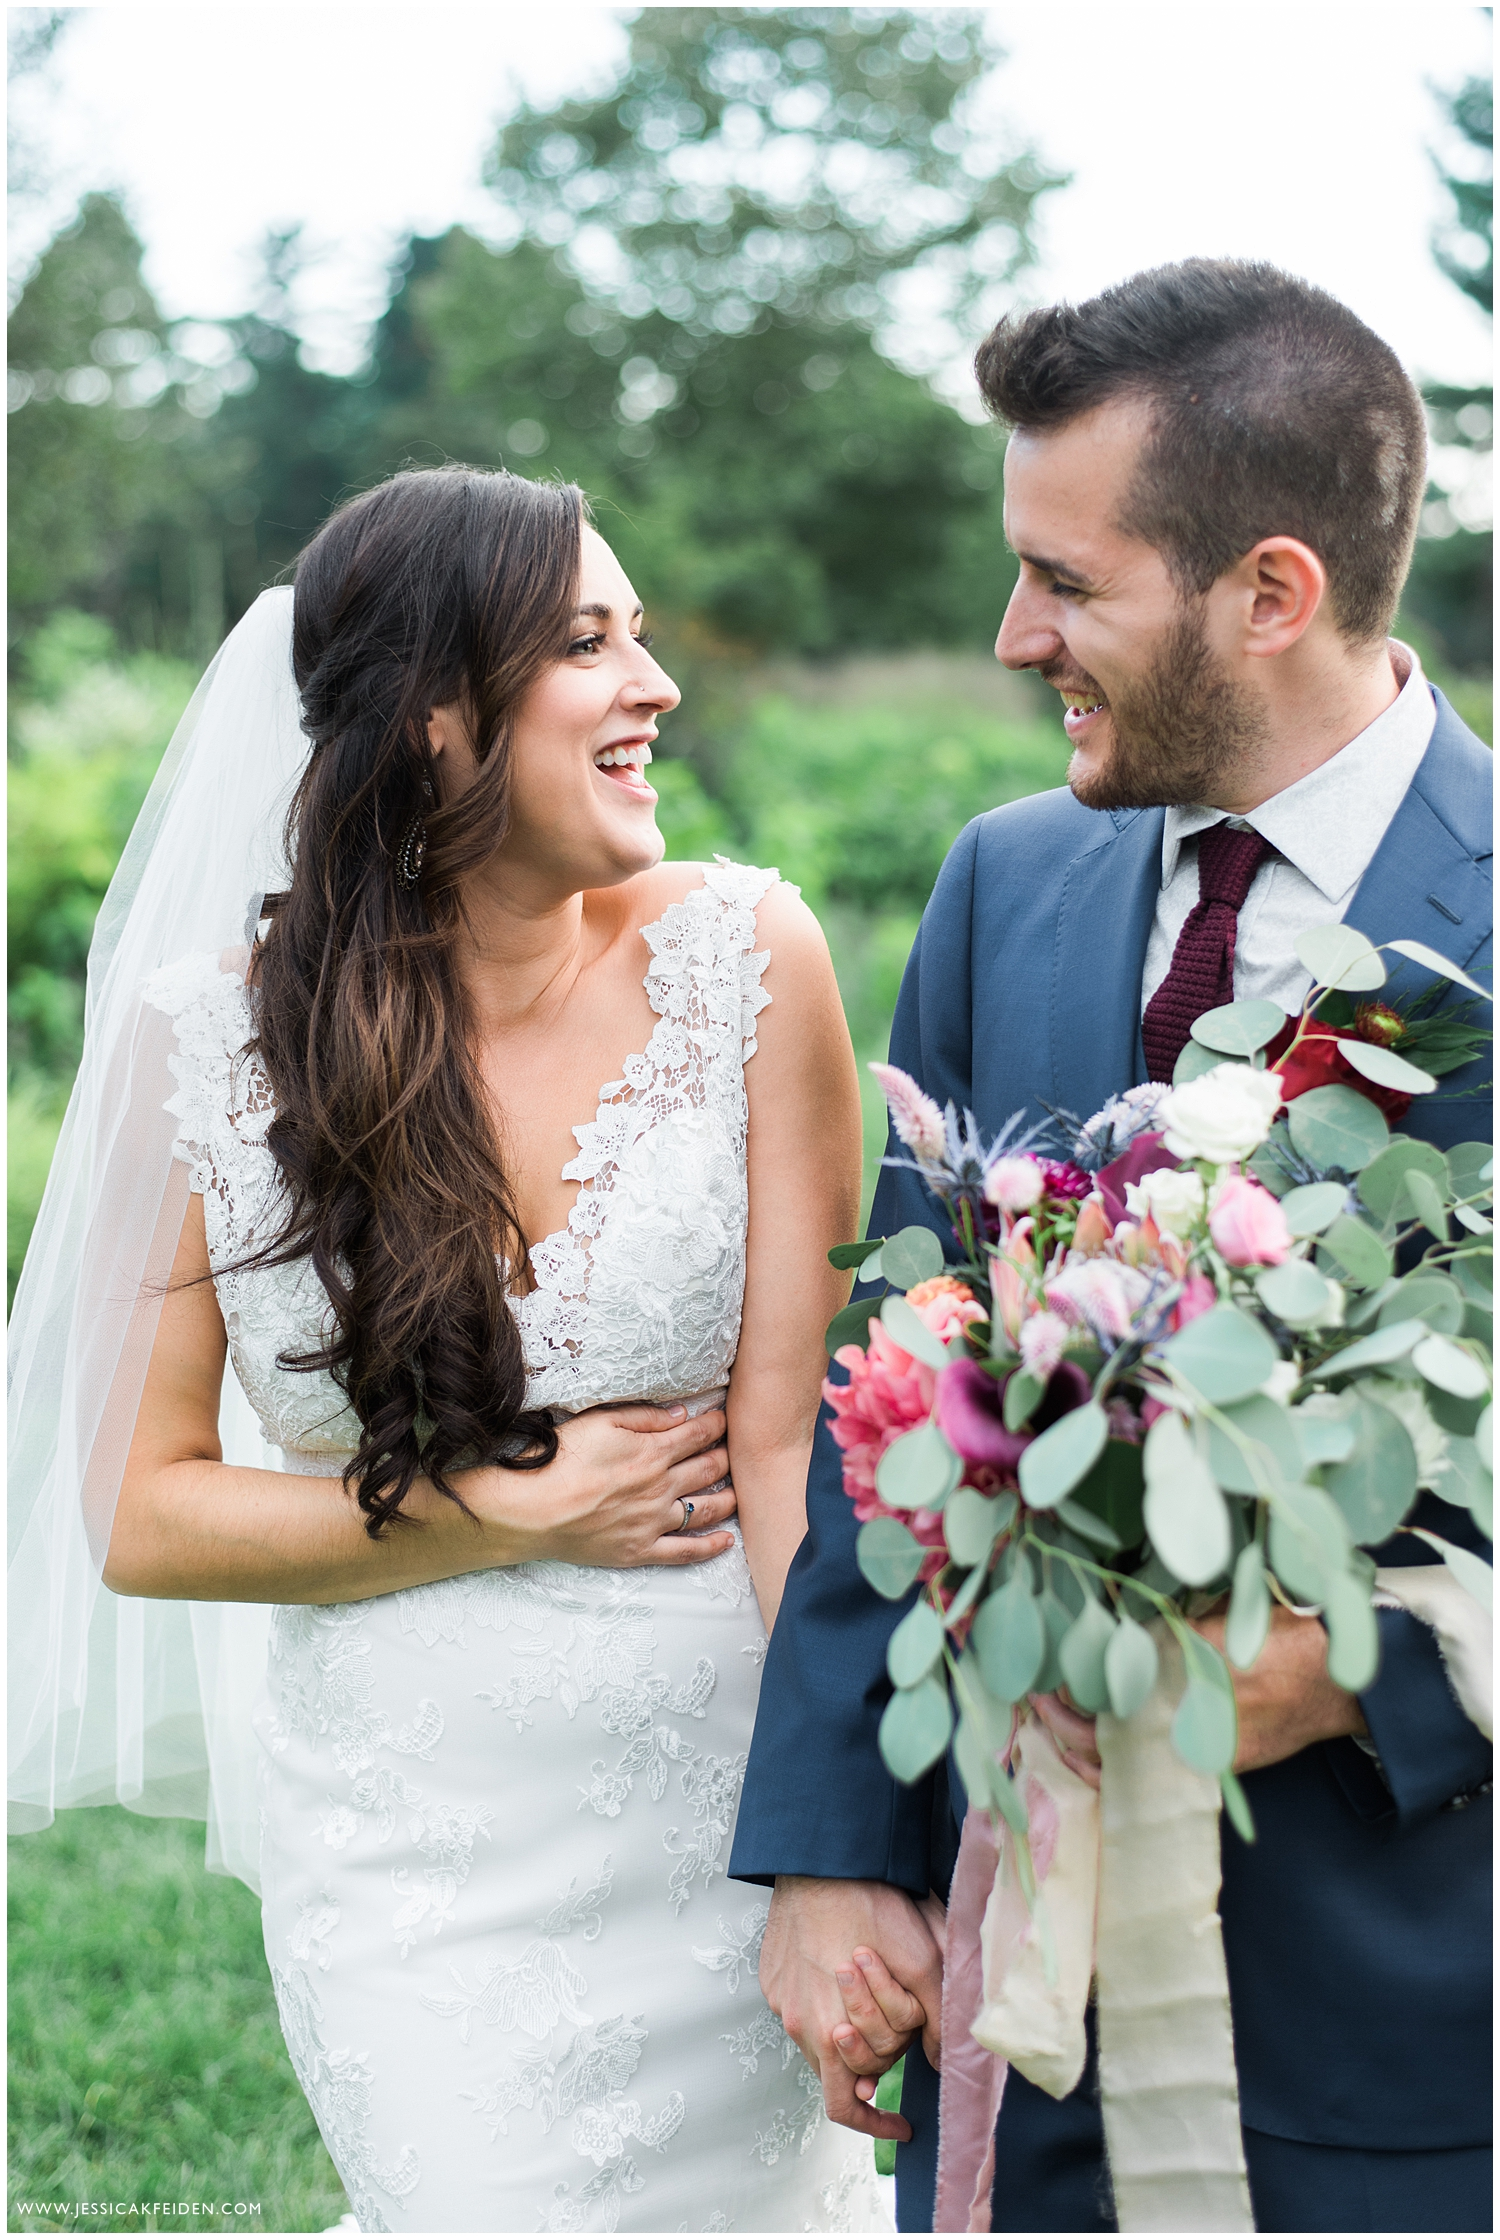 Jessica K Feiden Photography_Gardens at Elm Bank Wedding_0042.jpg